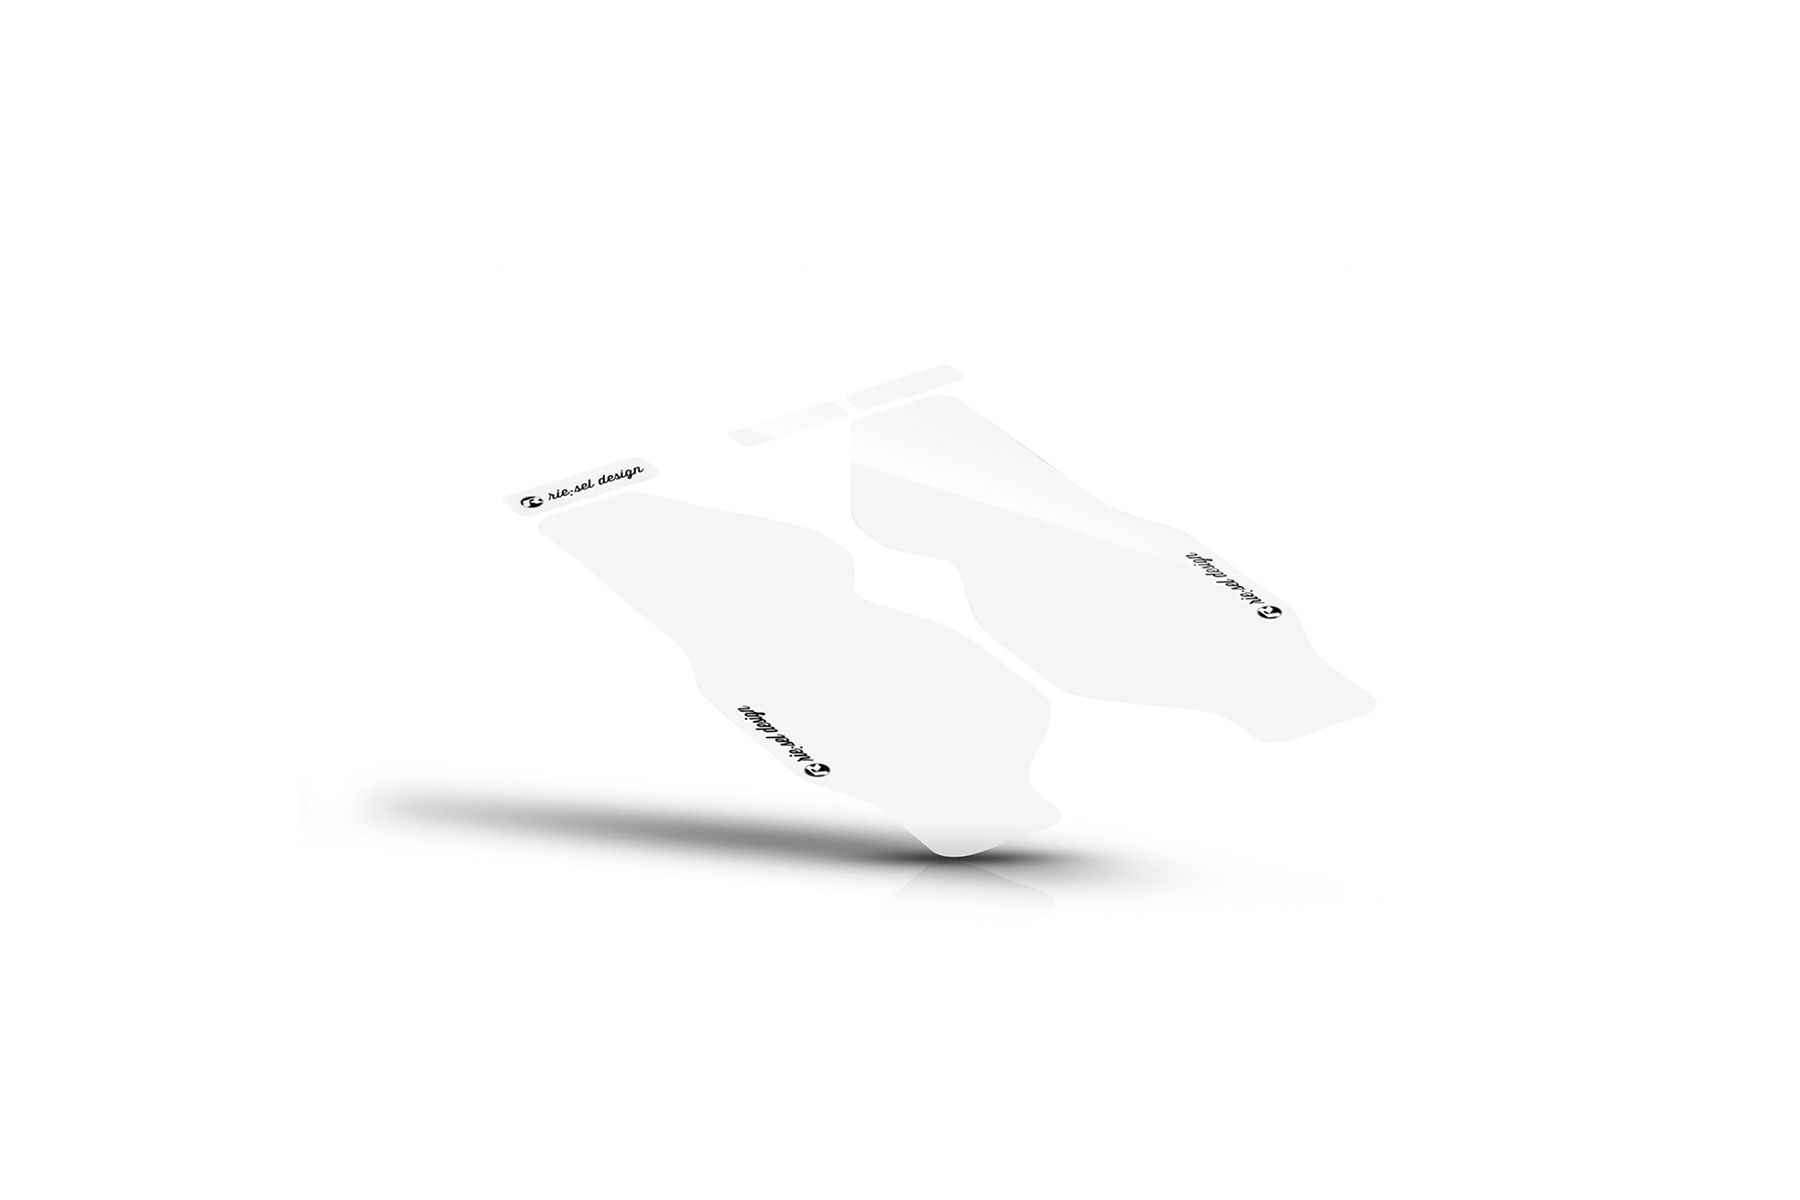 rie:sel design fork:guard Gabelschutz -2018-